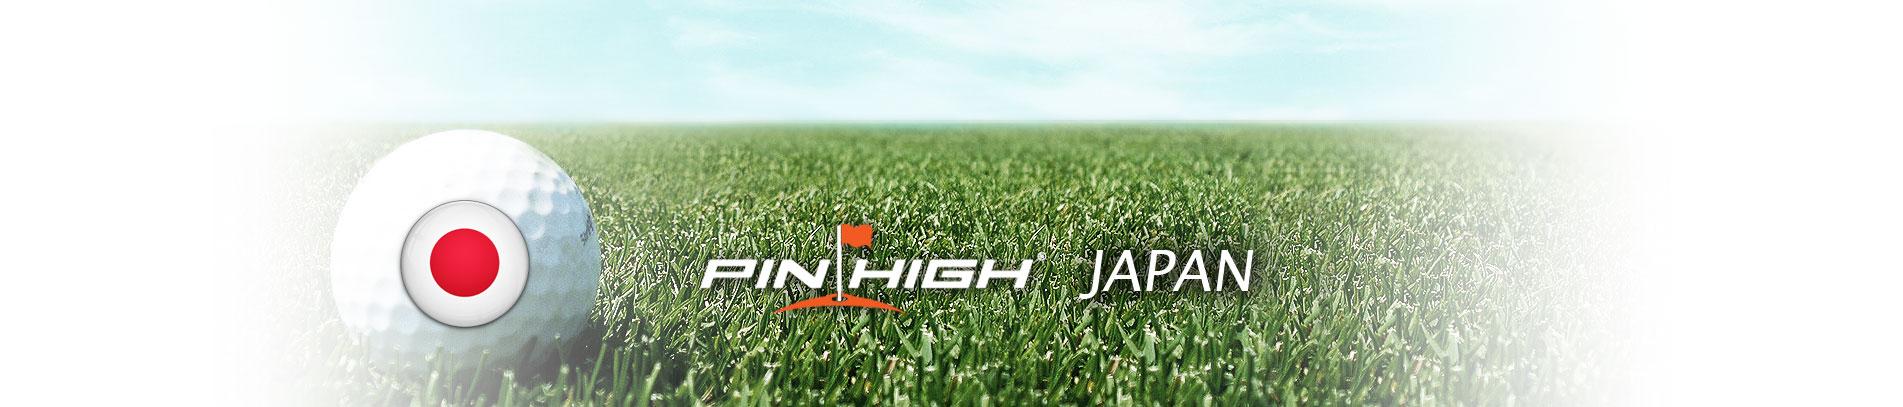 PIN HIGH JAPAN